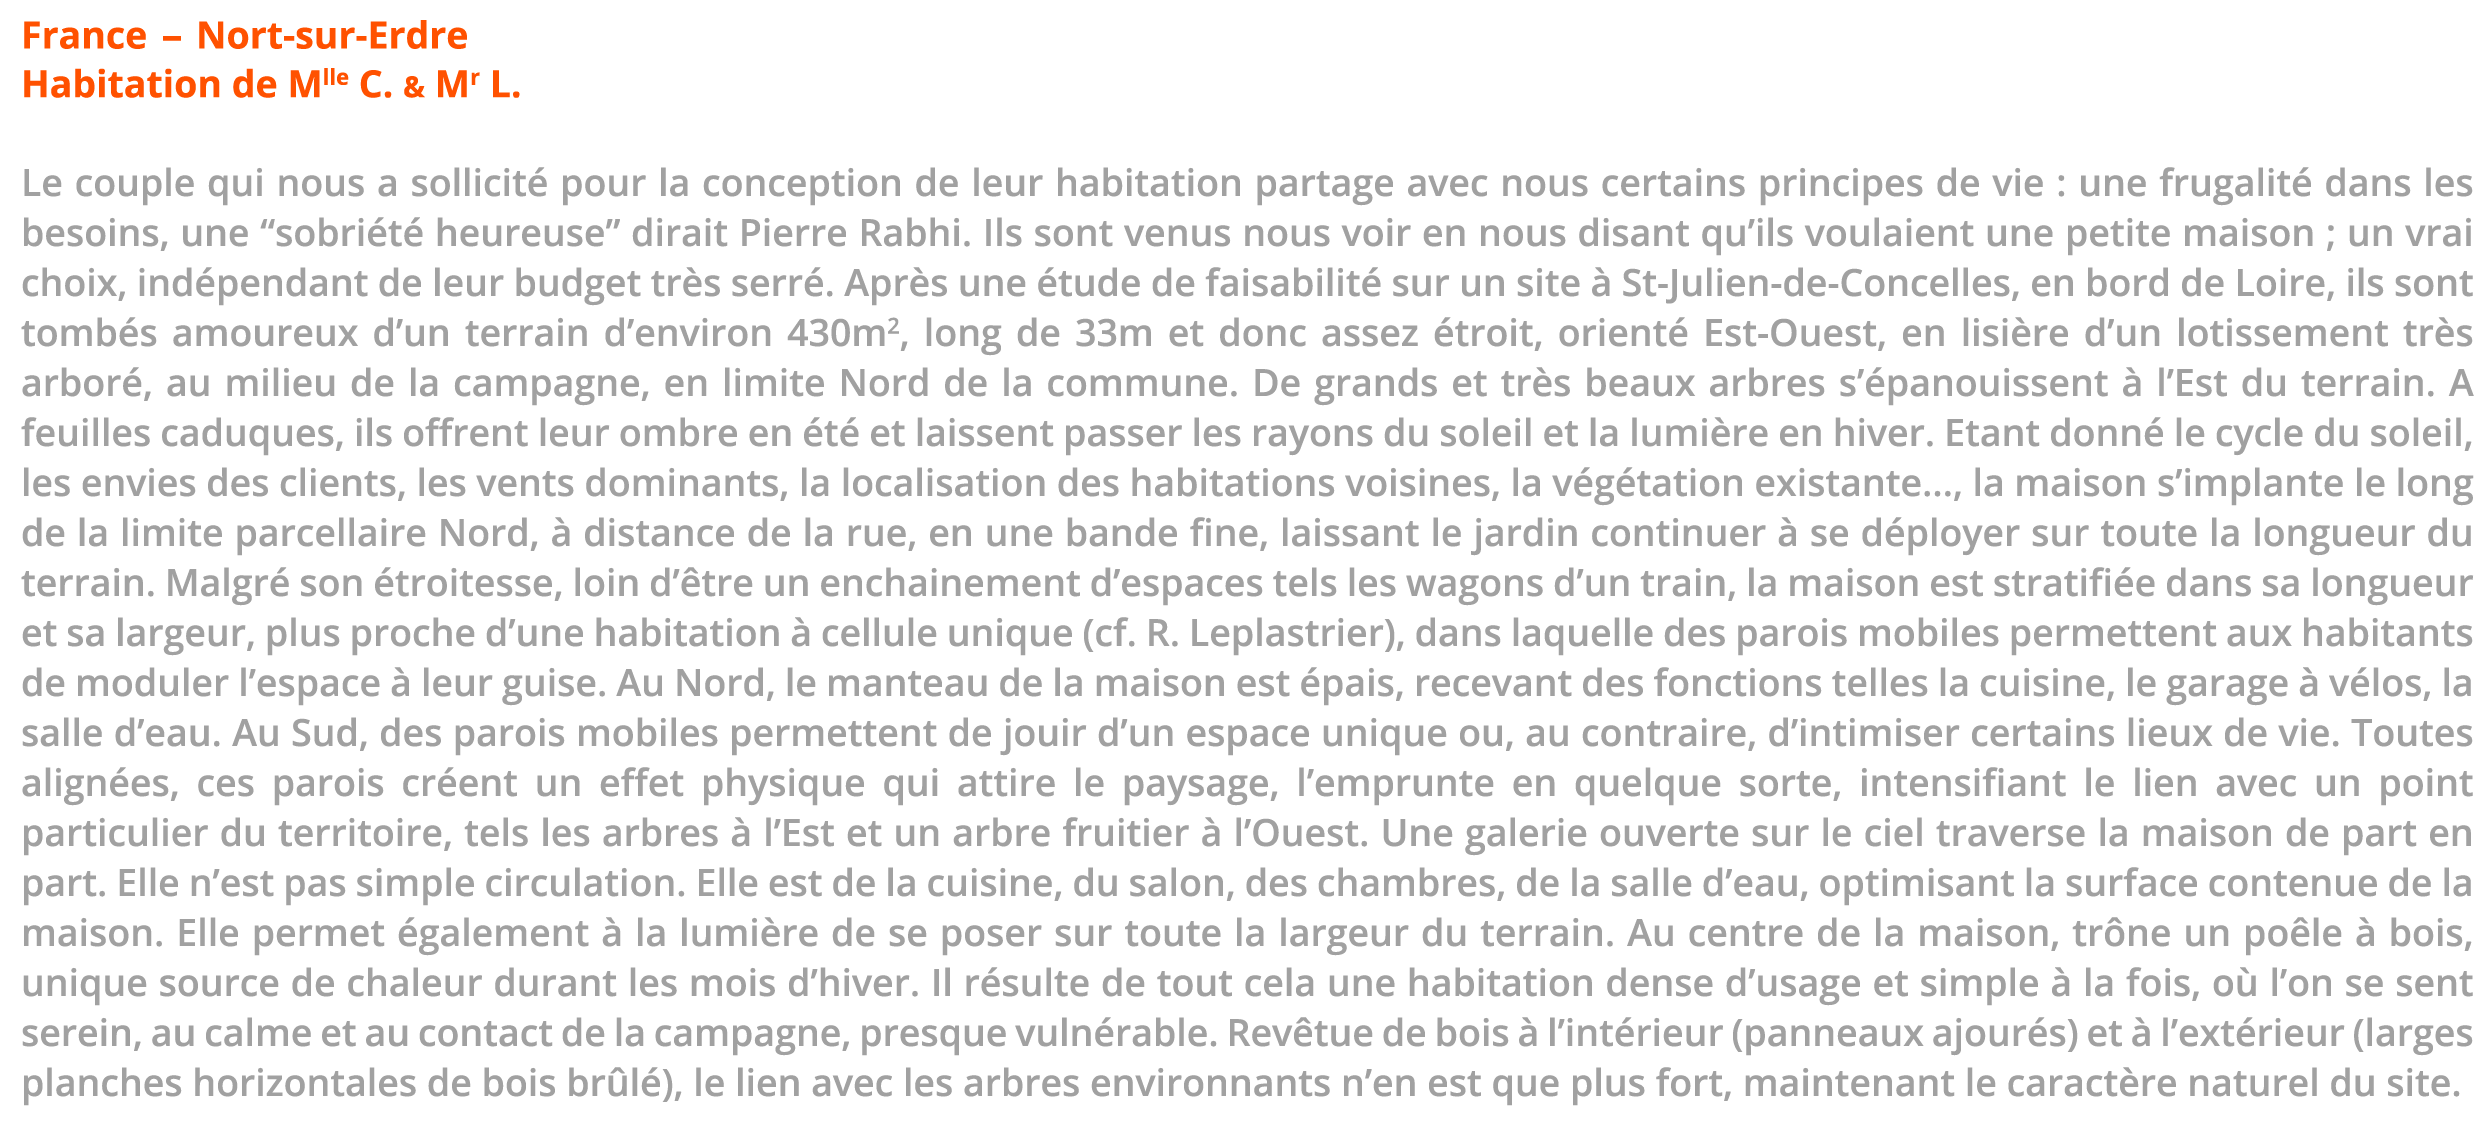 France-Nort-sur-Erdre-Texte.png